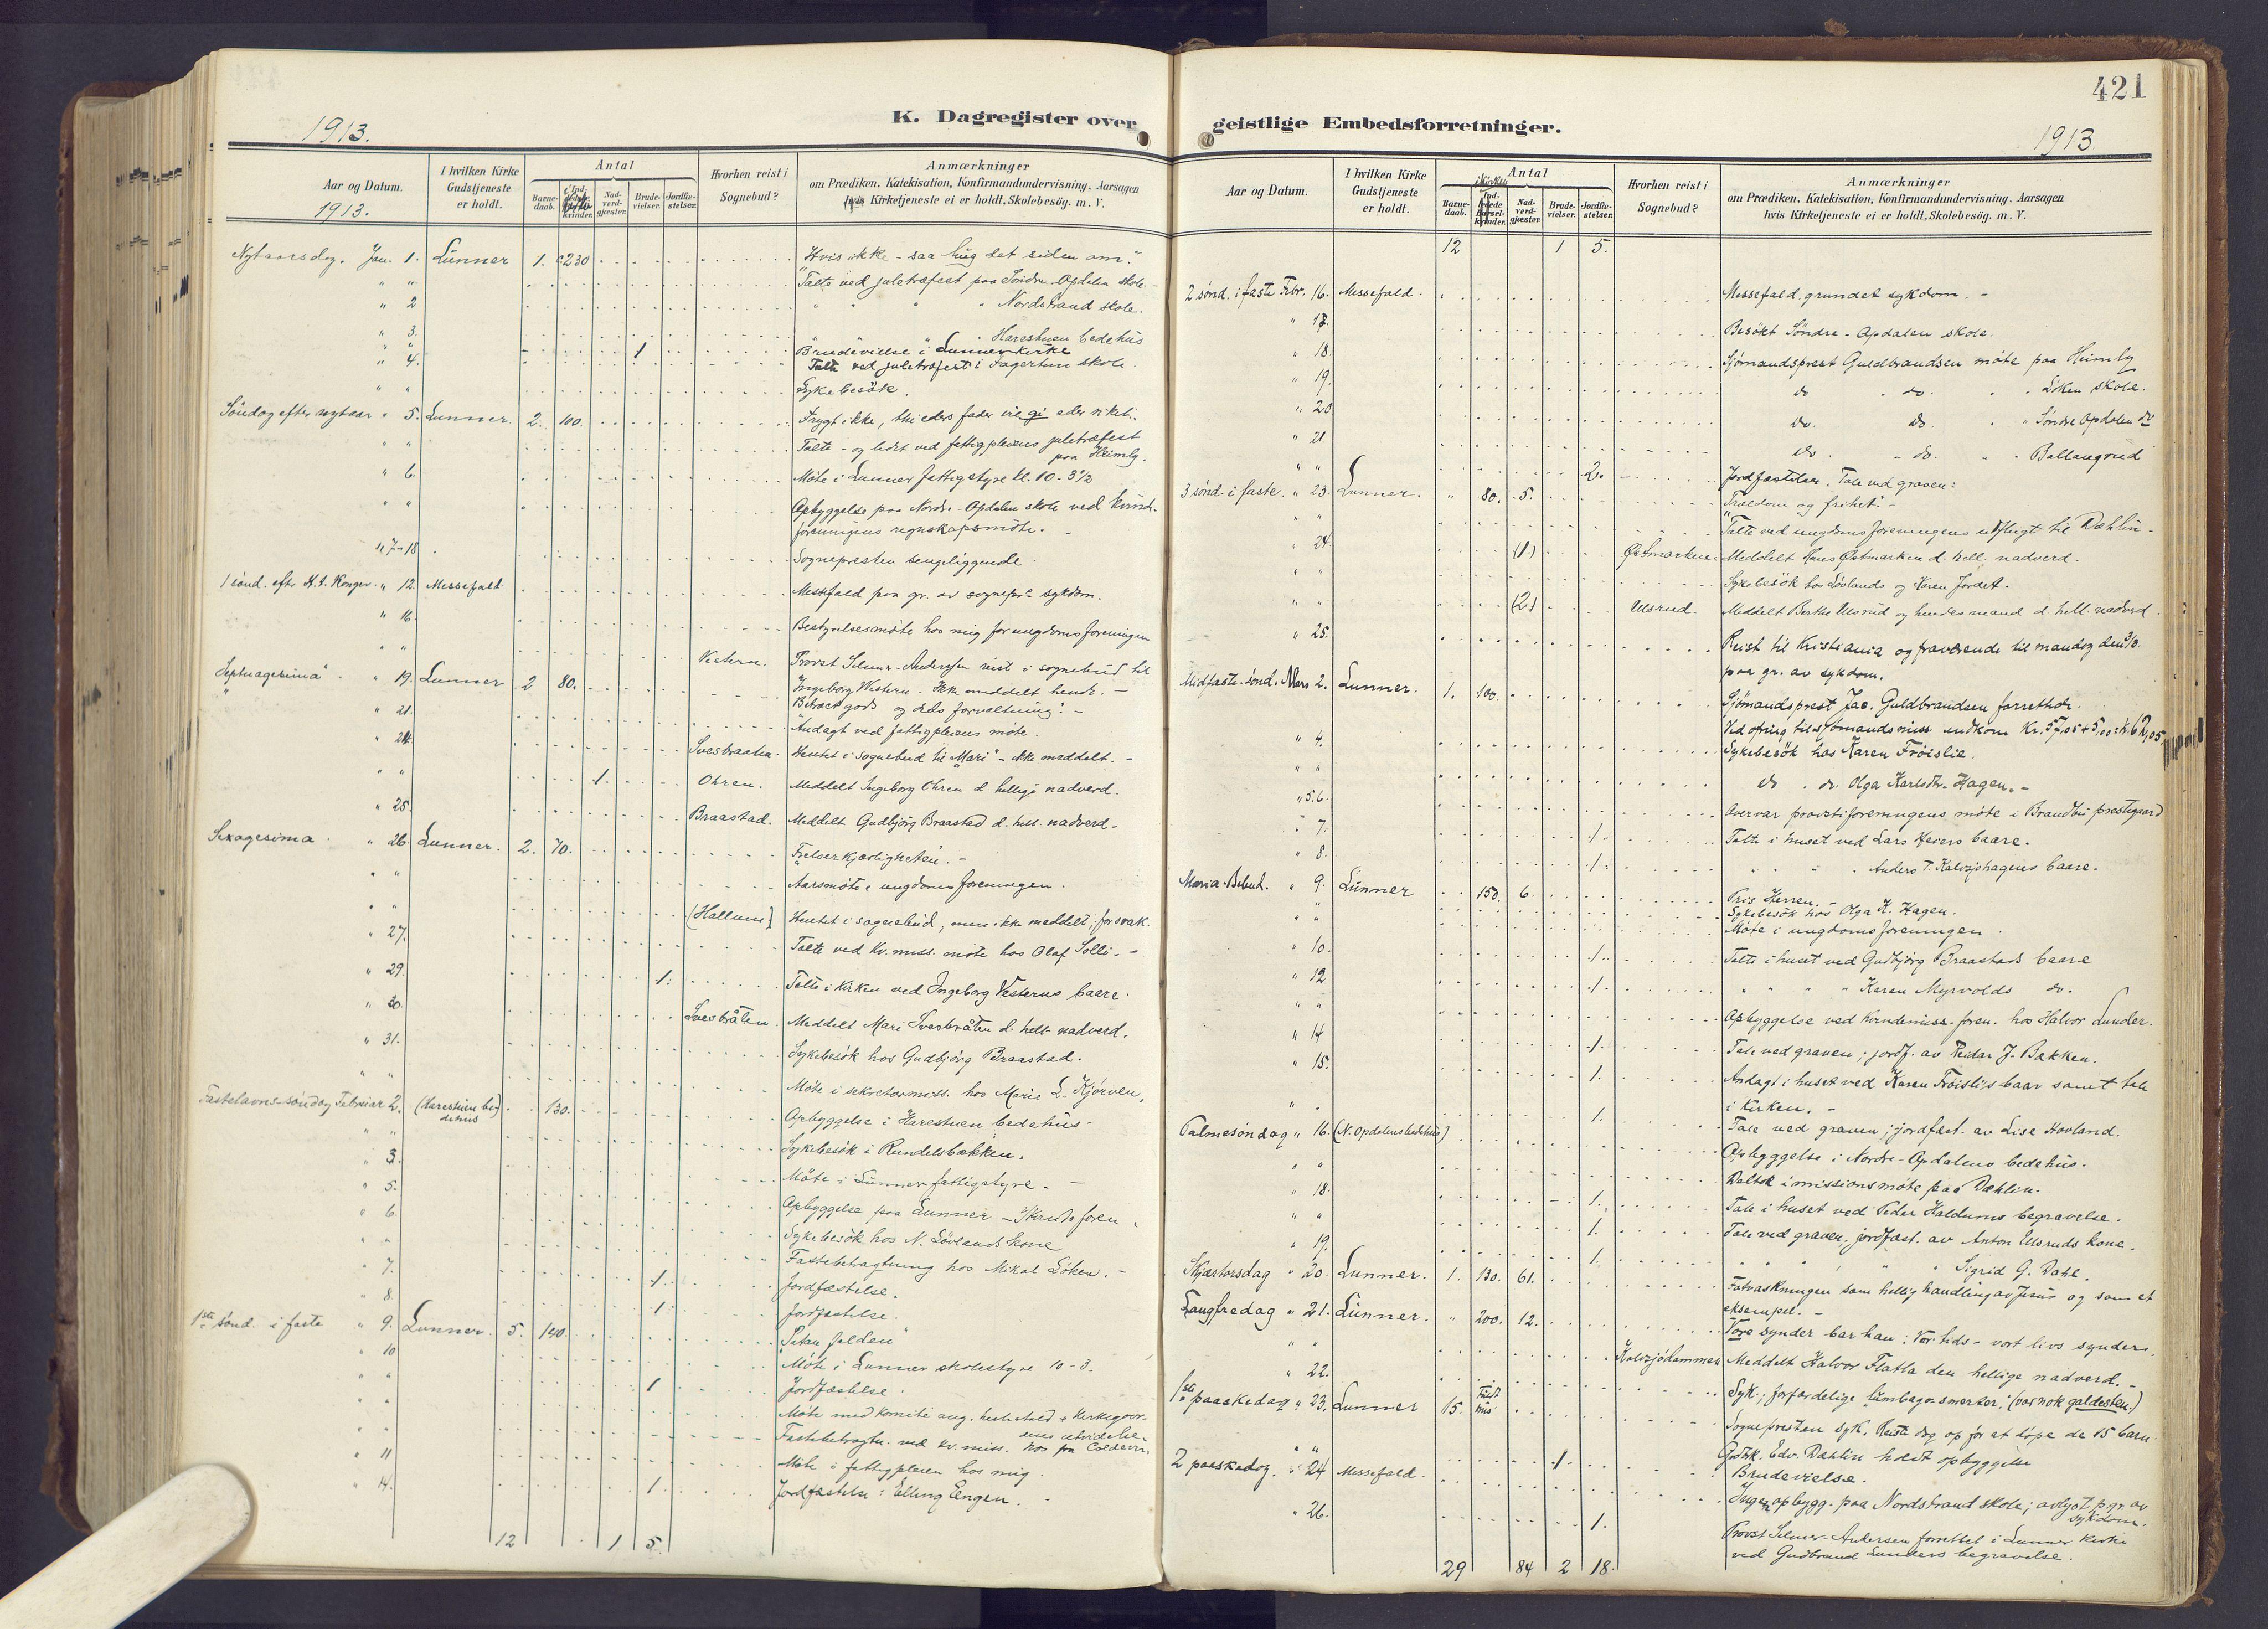 SAH, Lunner prestekontor, H/Ha/Haa/L0001: Ministerialbok nr. 1, 1907-1922, s. 421